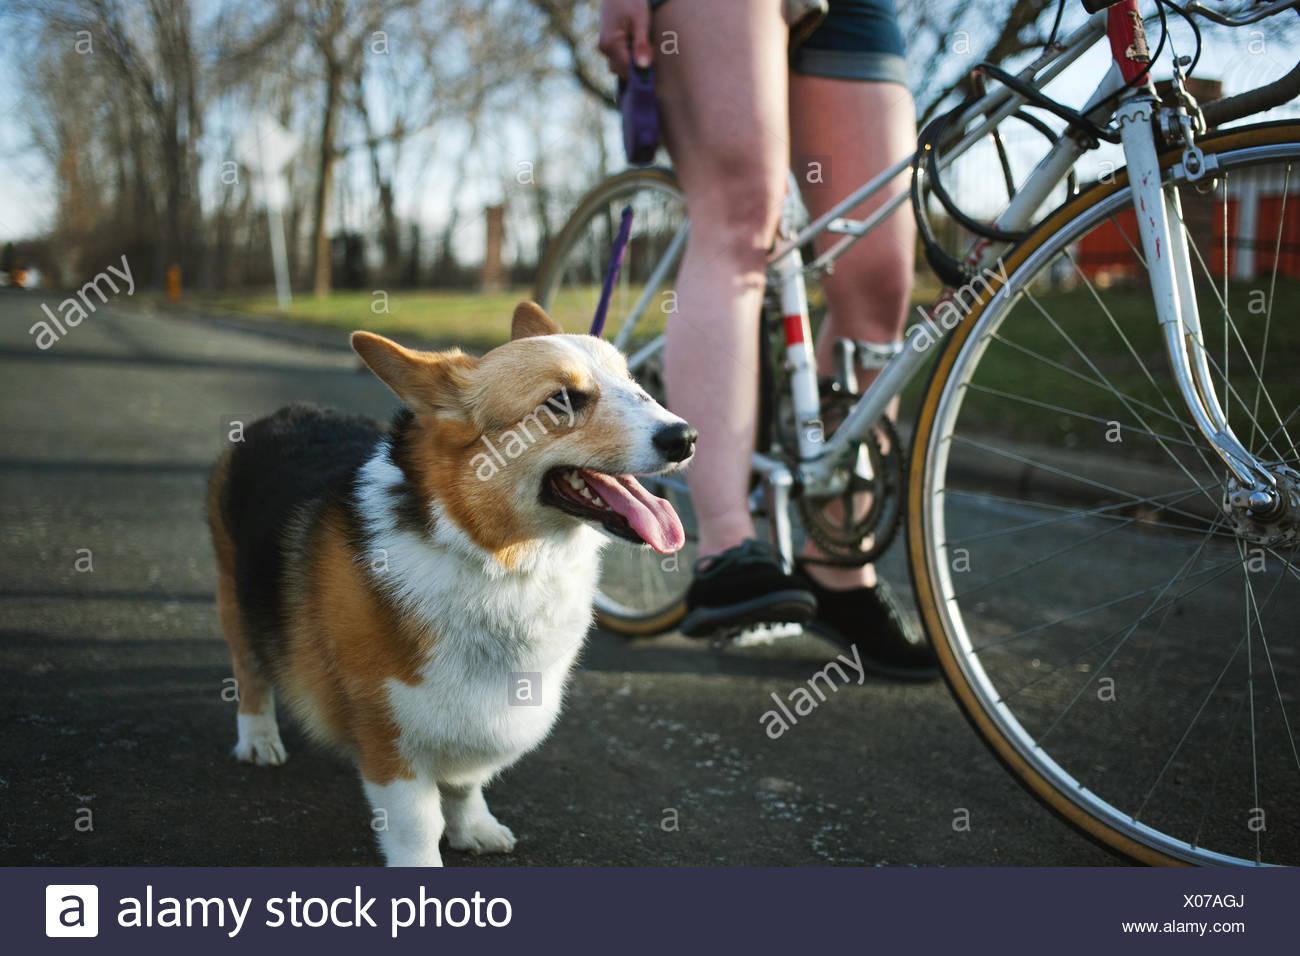 Pembroke Welsh Corgi tatenlos Seite der jungen Frau auf dem Fahrrad Stockbild